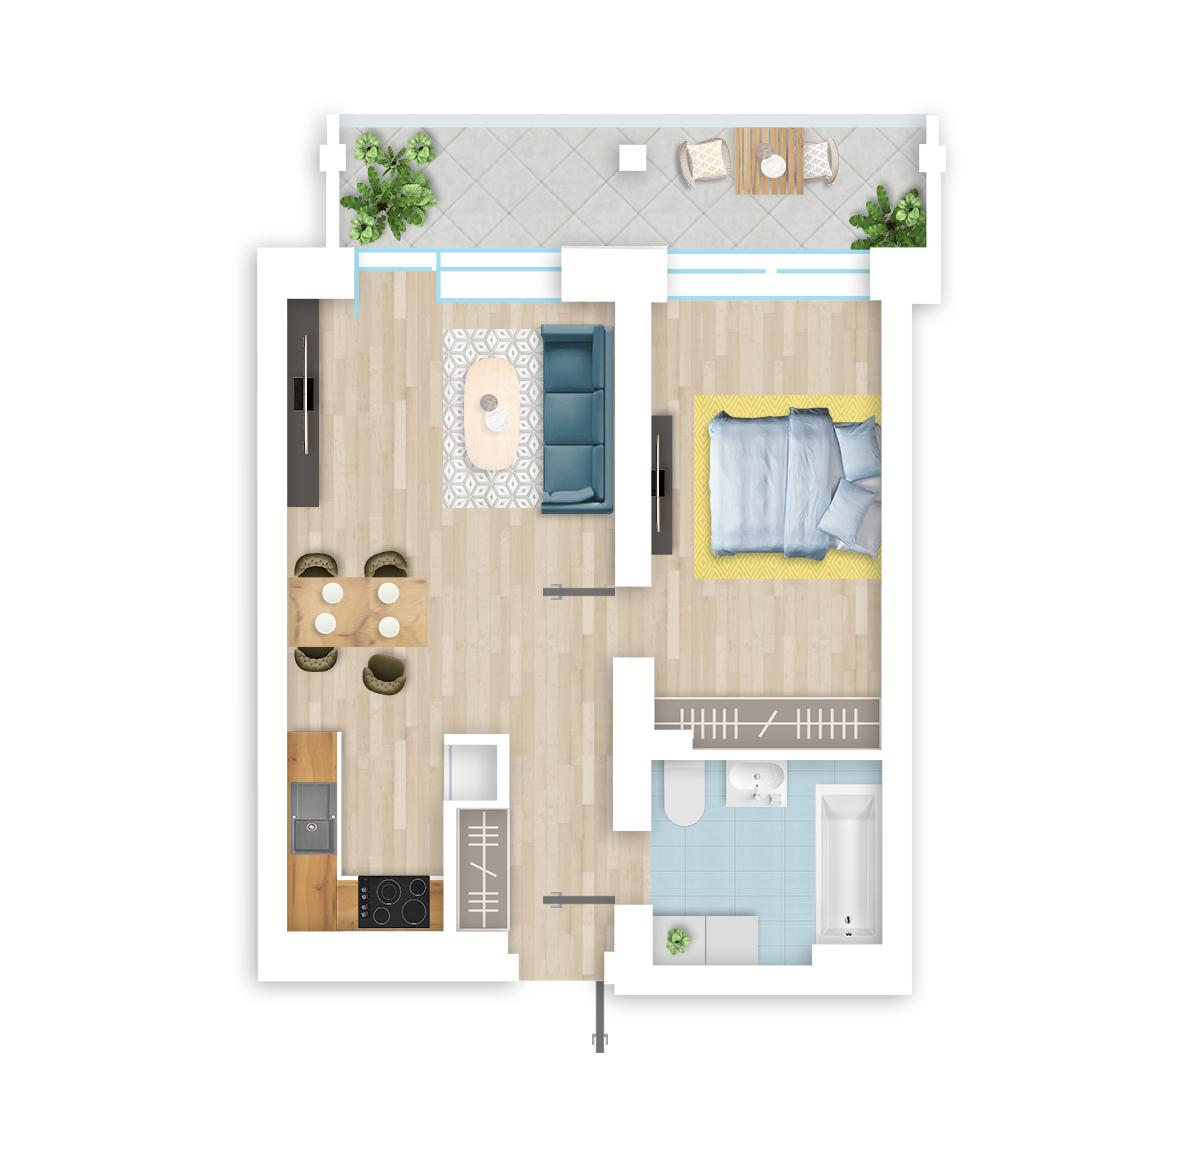 parduodamas butas Lietaus g. 4 - 10 Vilniuje, buto 3D vaizdas